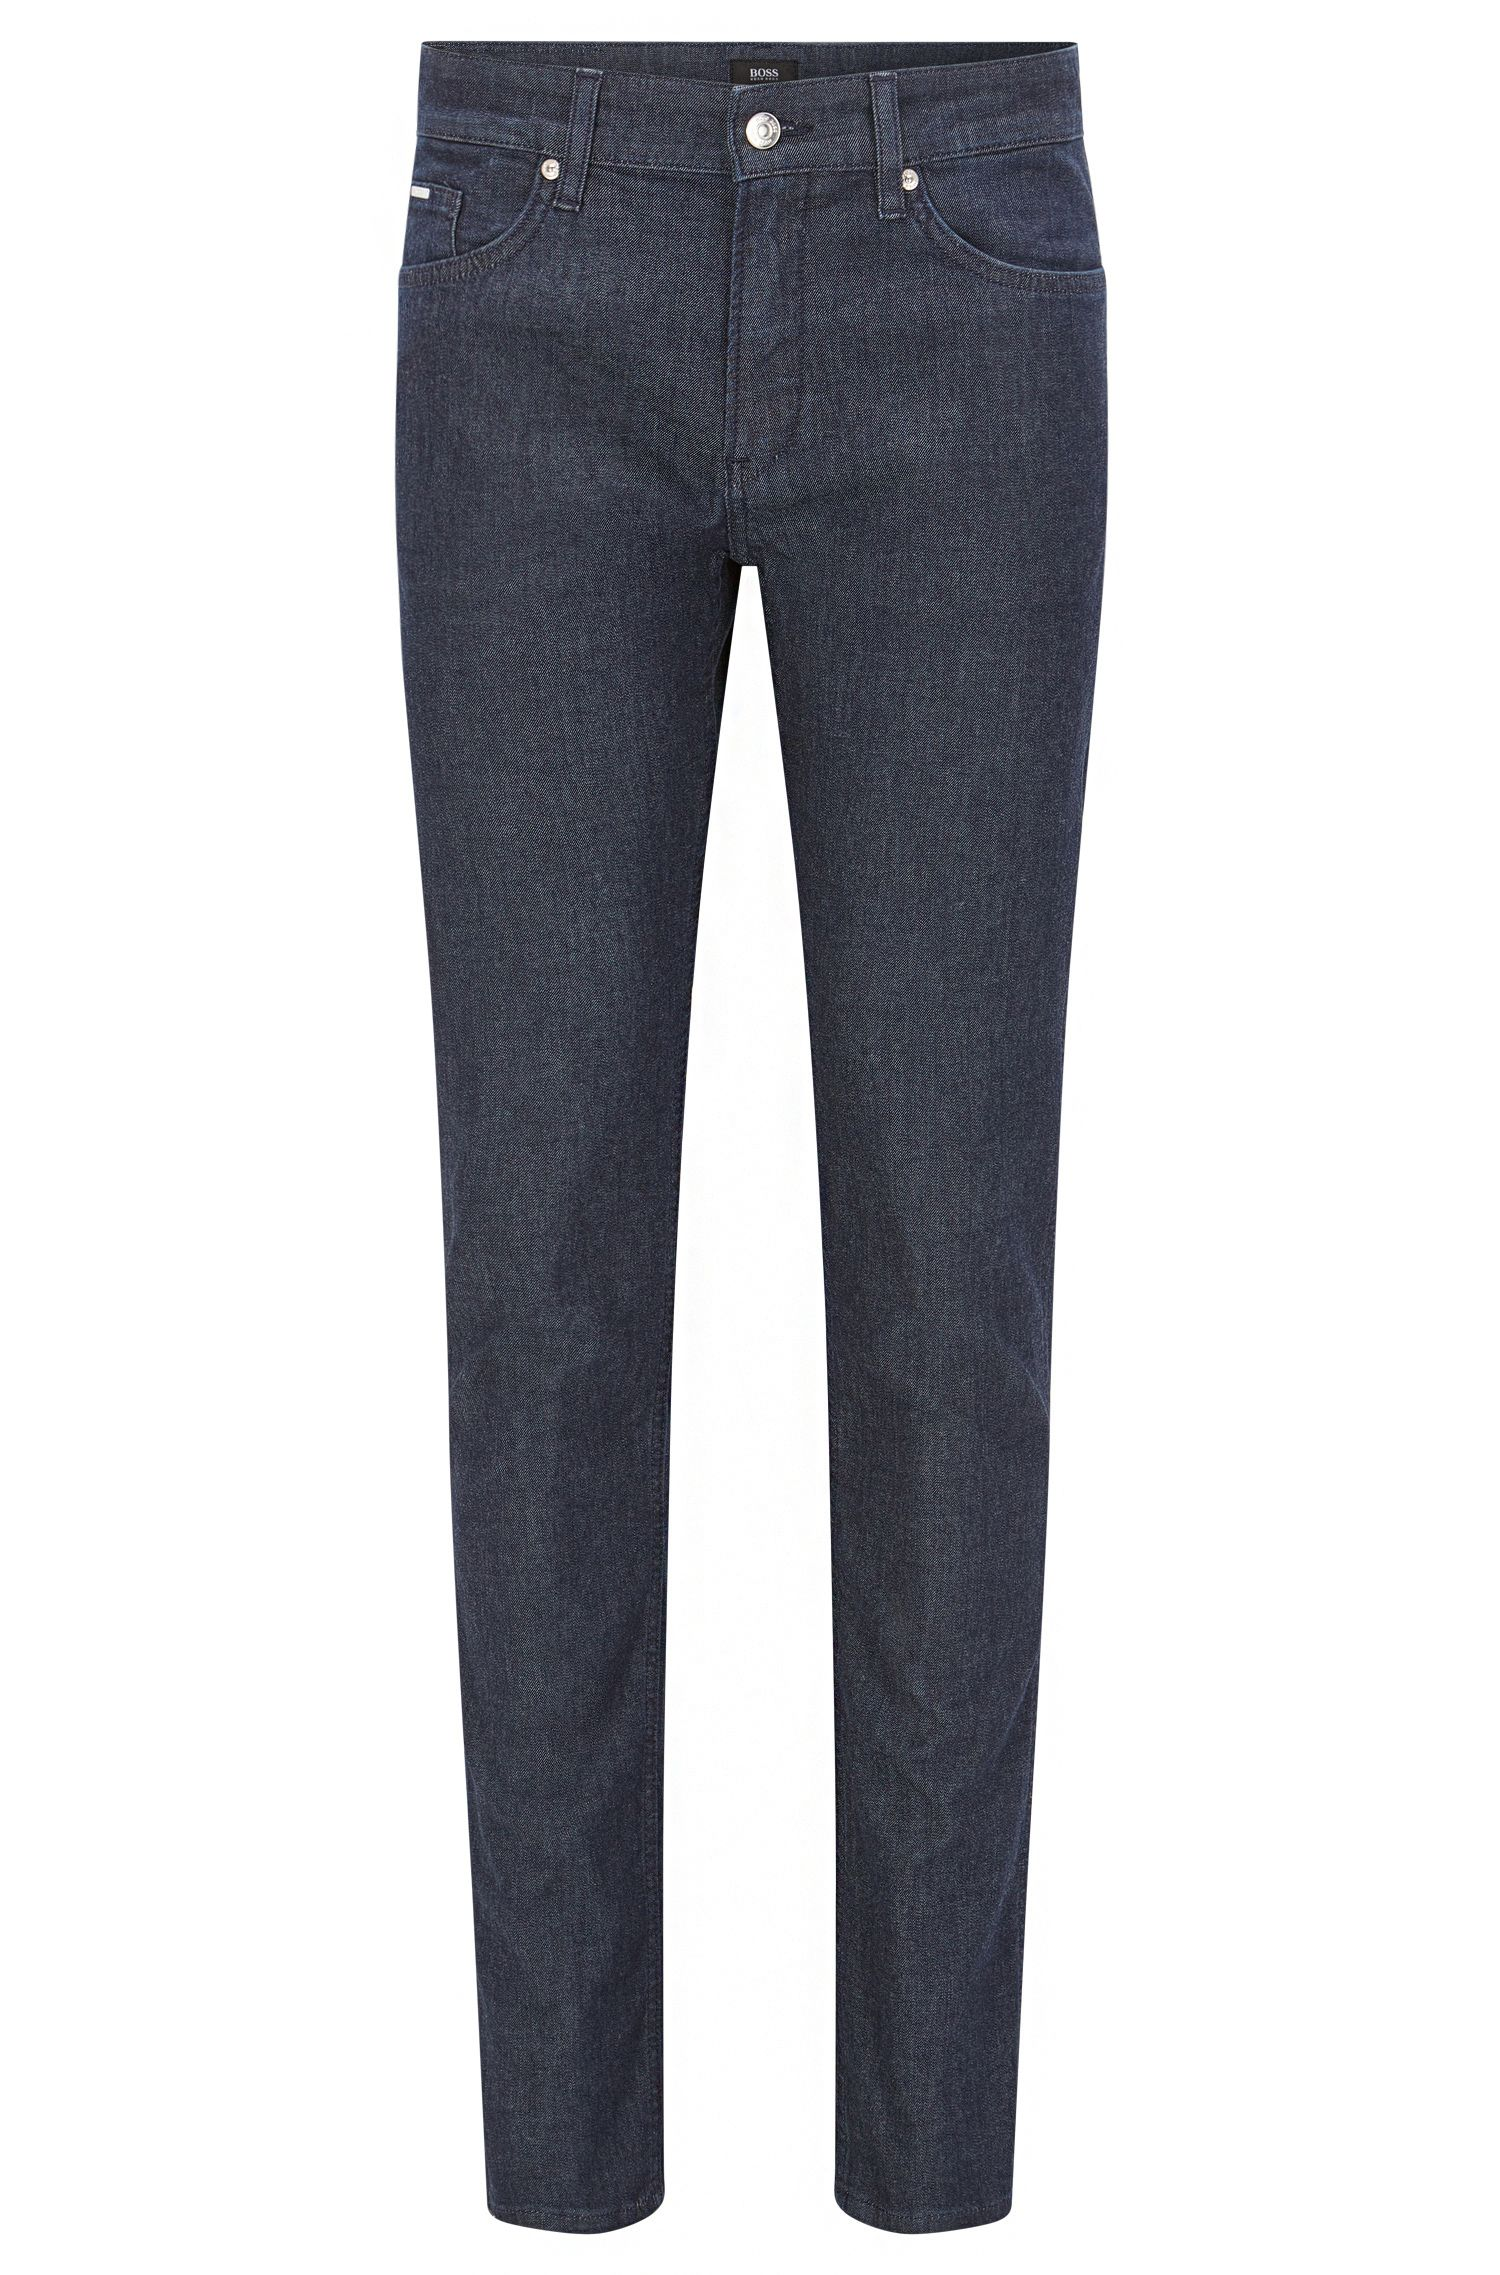 Slim-fit donkerblauwe jeans van stretchdenim